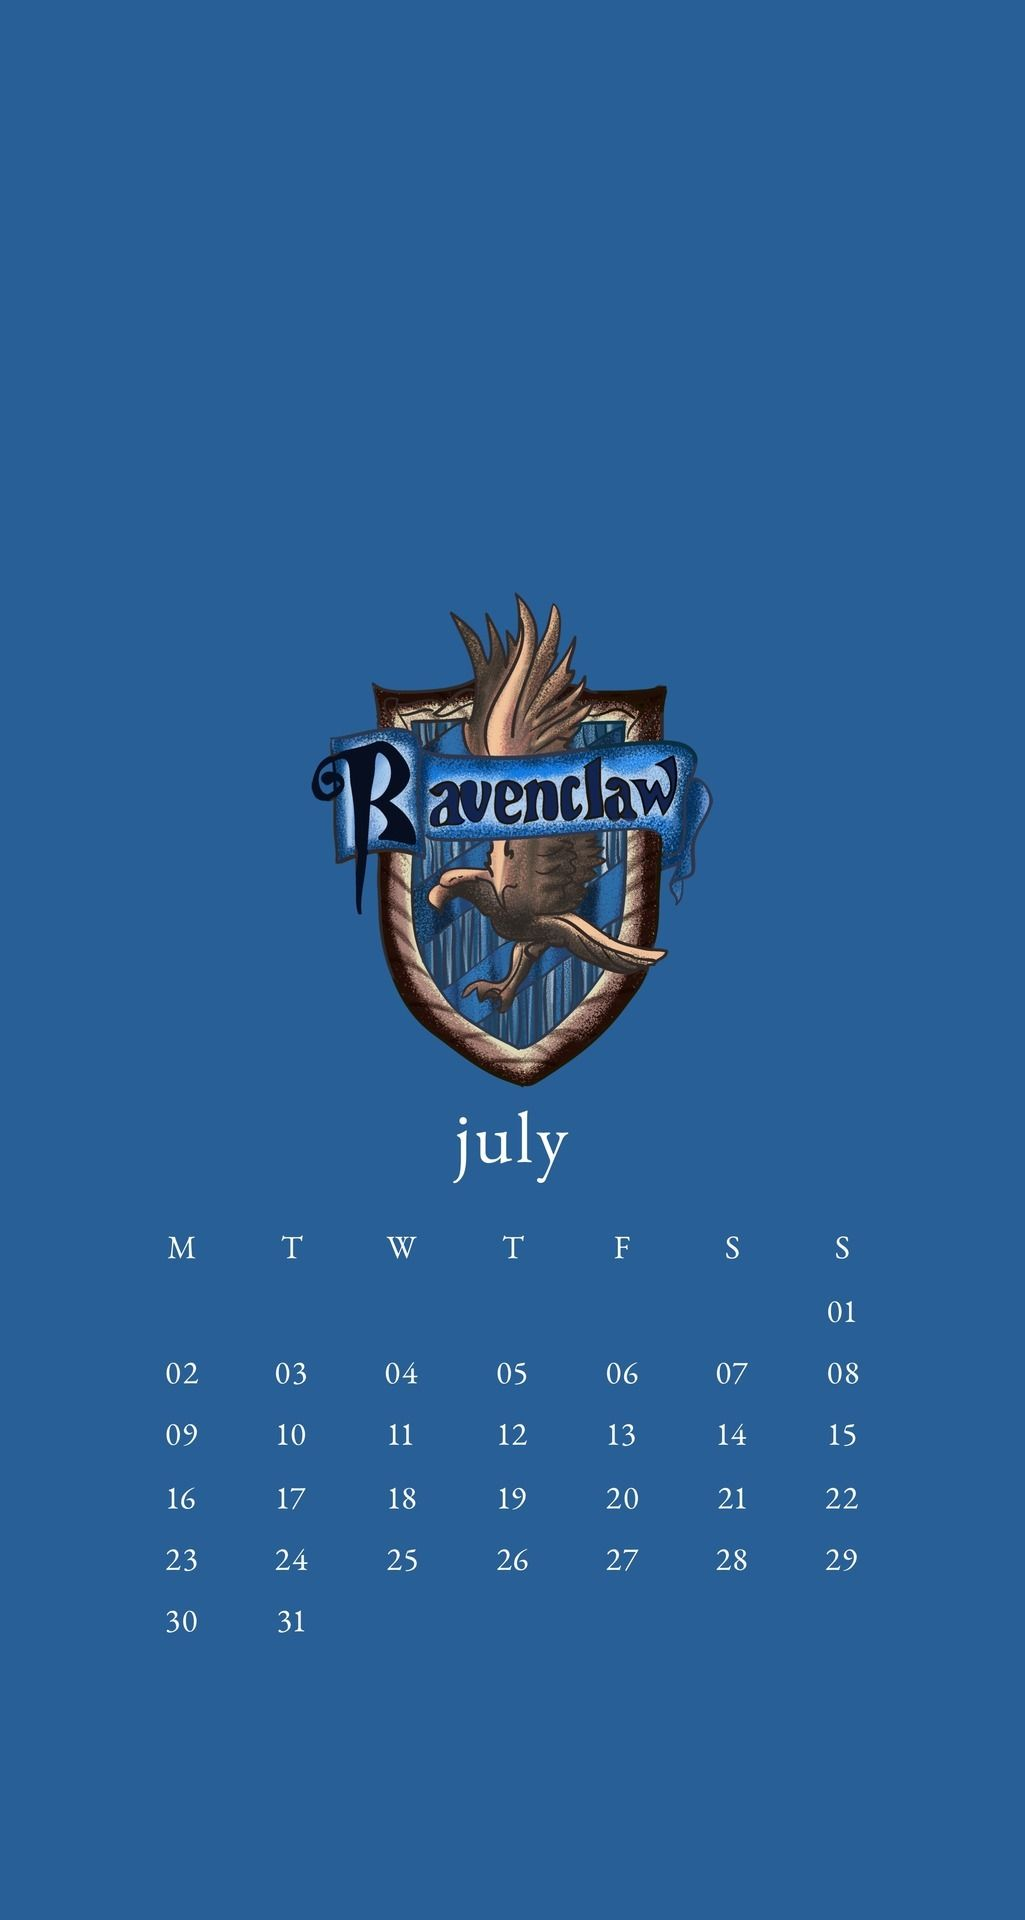 July 2018 Calendar Wallpaper Phone Harry Potter Hogwarts Ravenclaw Harry Potter Ravenclaw Harry Potter Wallpaper Calendar Wallpaper